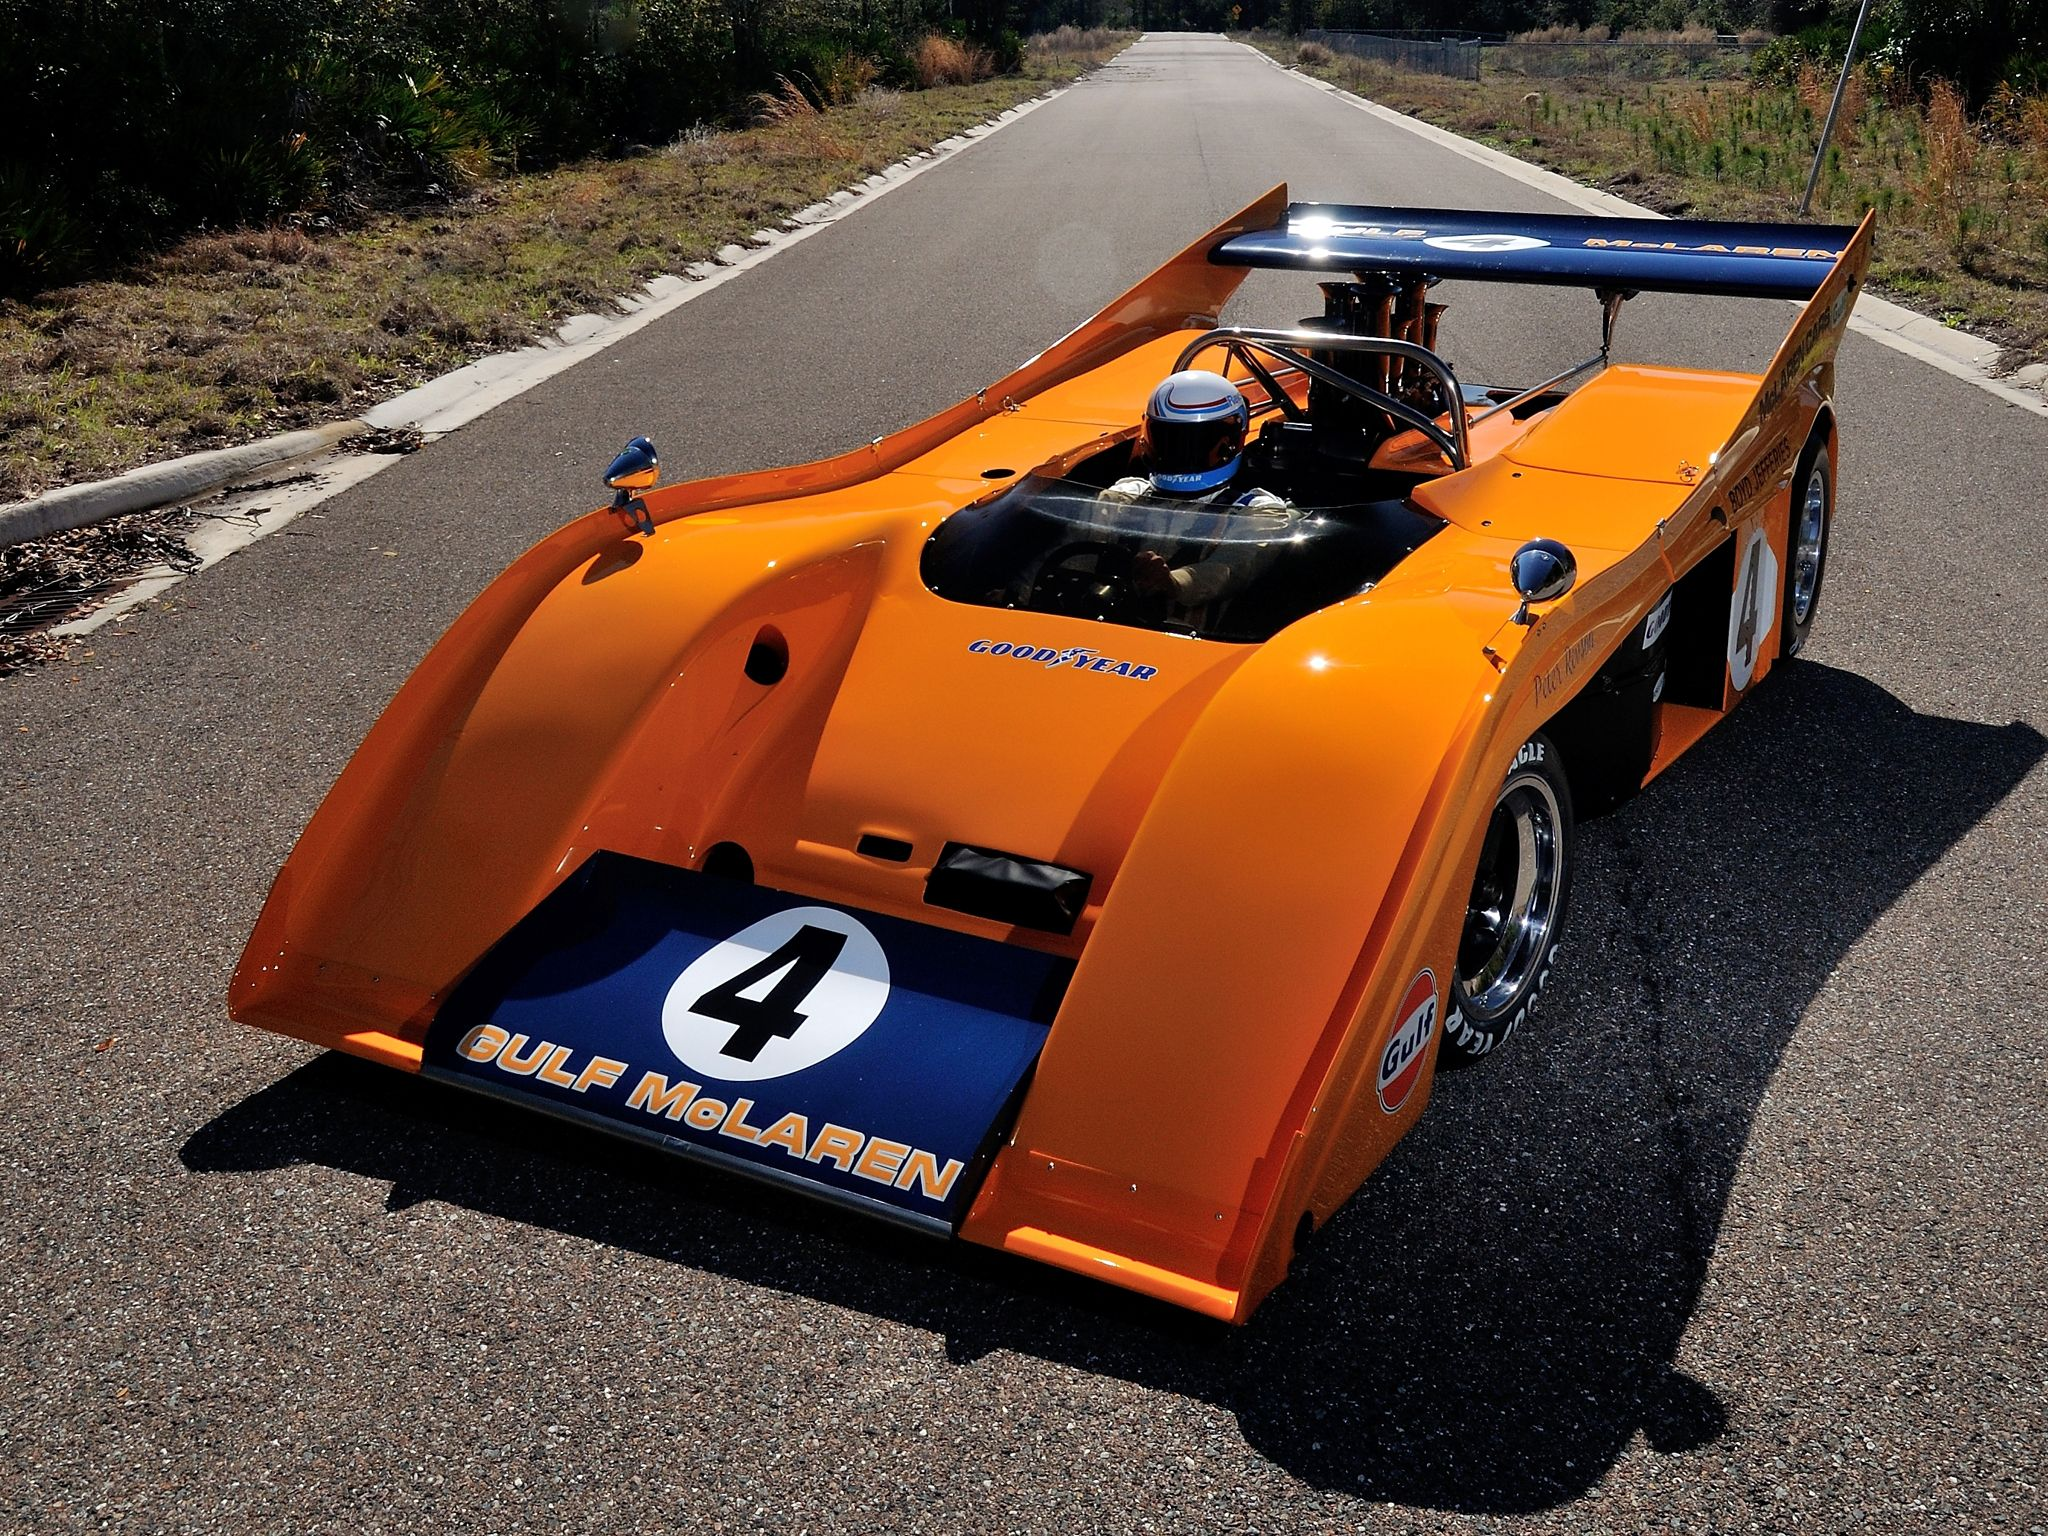 Gulf McLaren | Gulf Racing | Pinterest | Cars, Sports cars and Auto ...